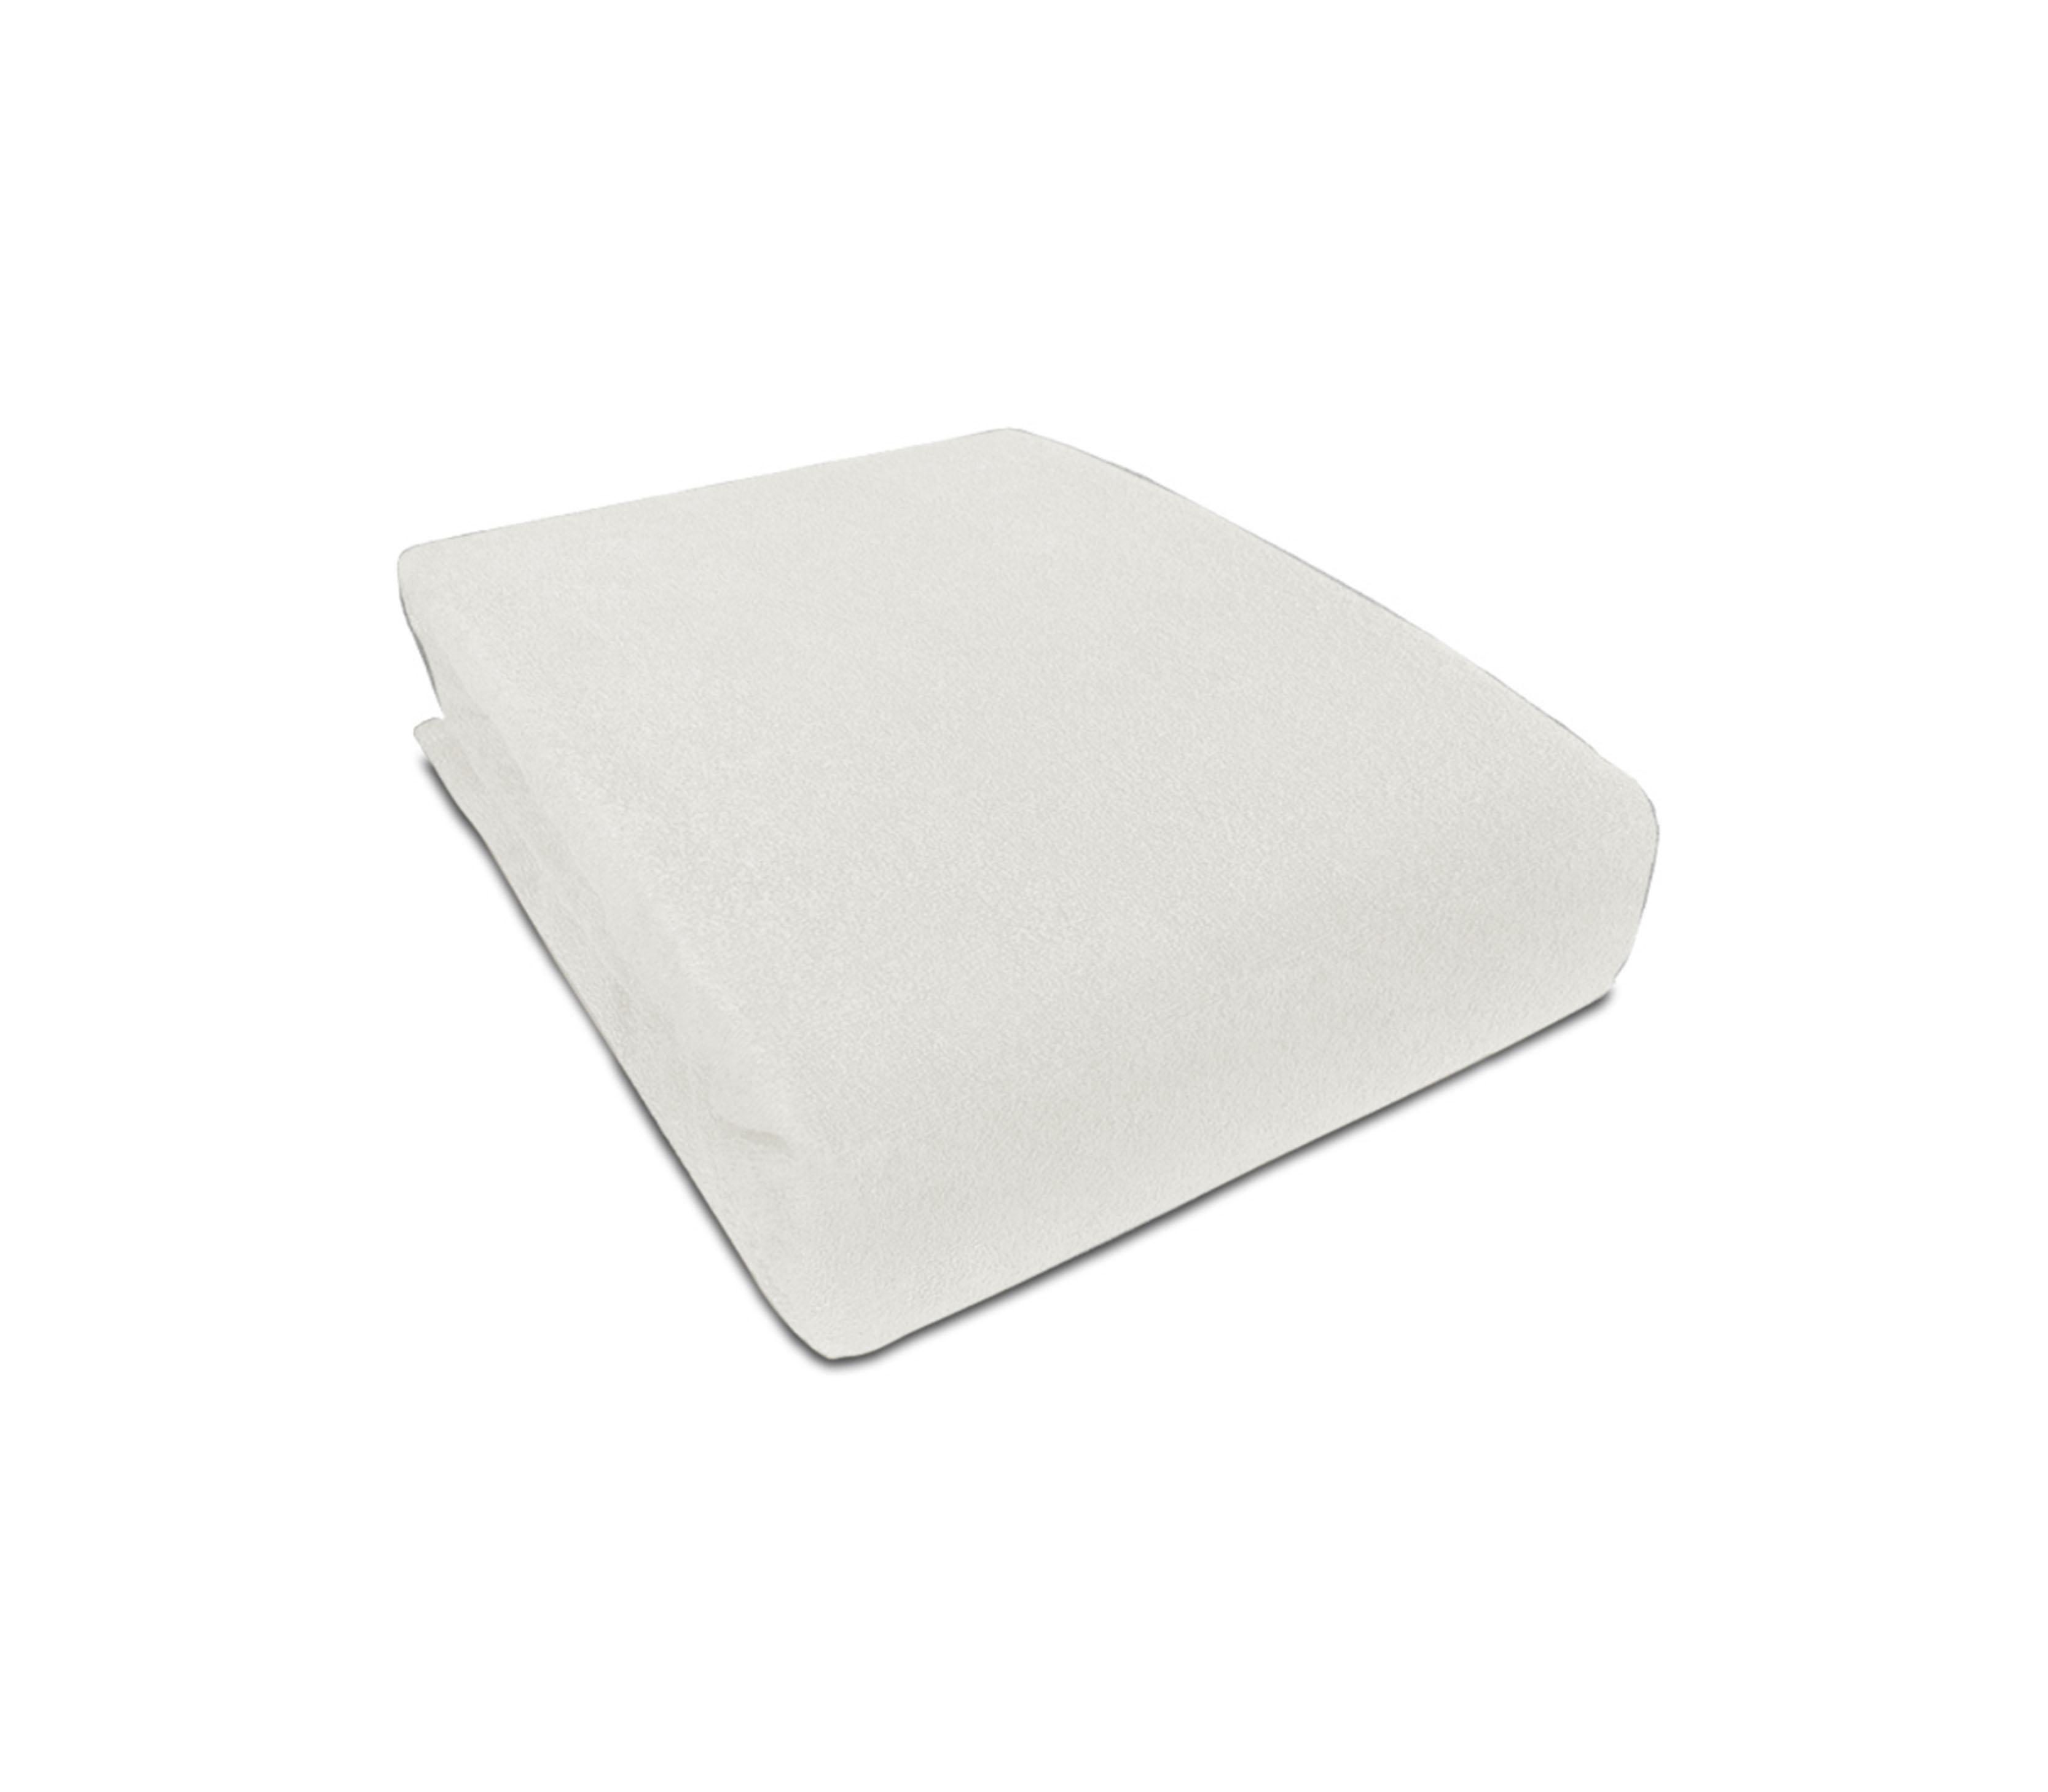 Aga prostěradlo FROTÉ 160X200 cm Barva prostěradla: Bílá